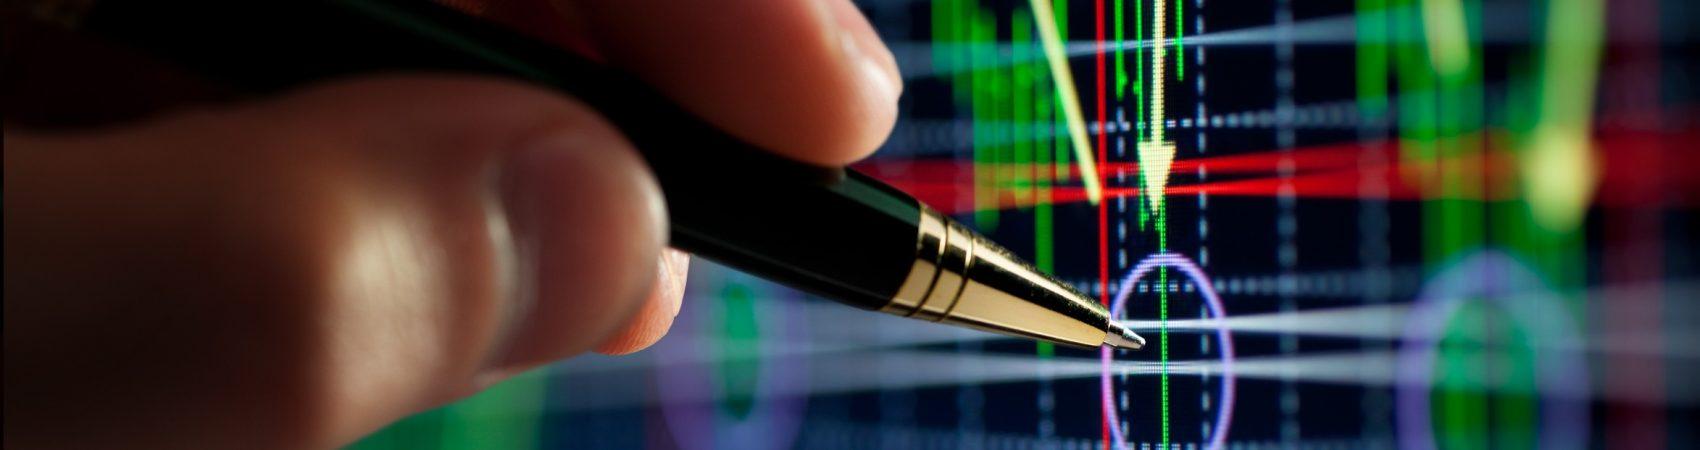 S&P 500 Index Analysis: Breakout or Breakdown?